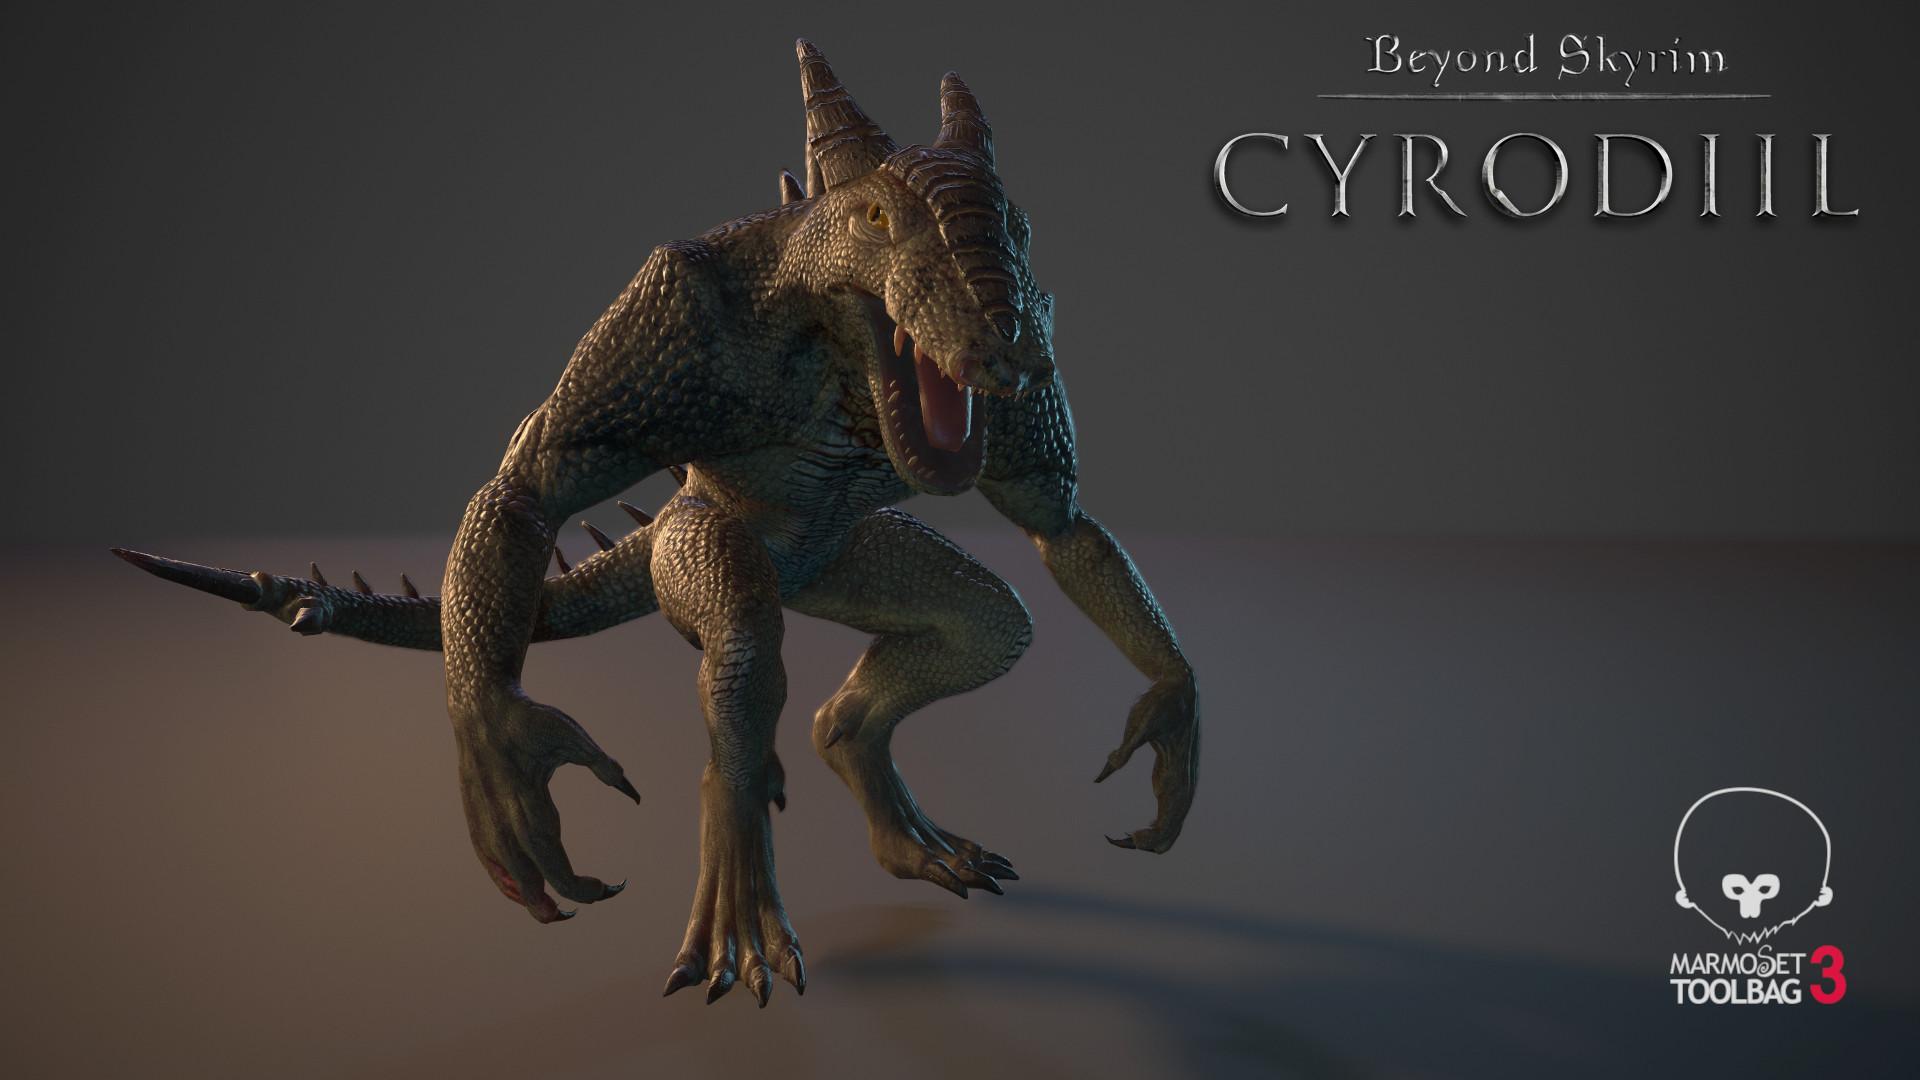 Newsletter Volume 5, July 2018 - Beyond Skyrim